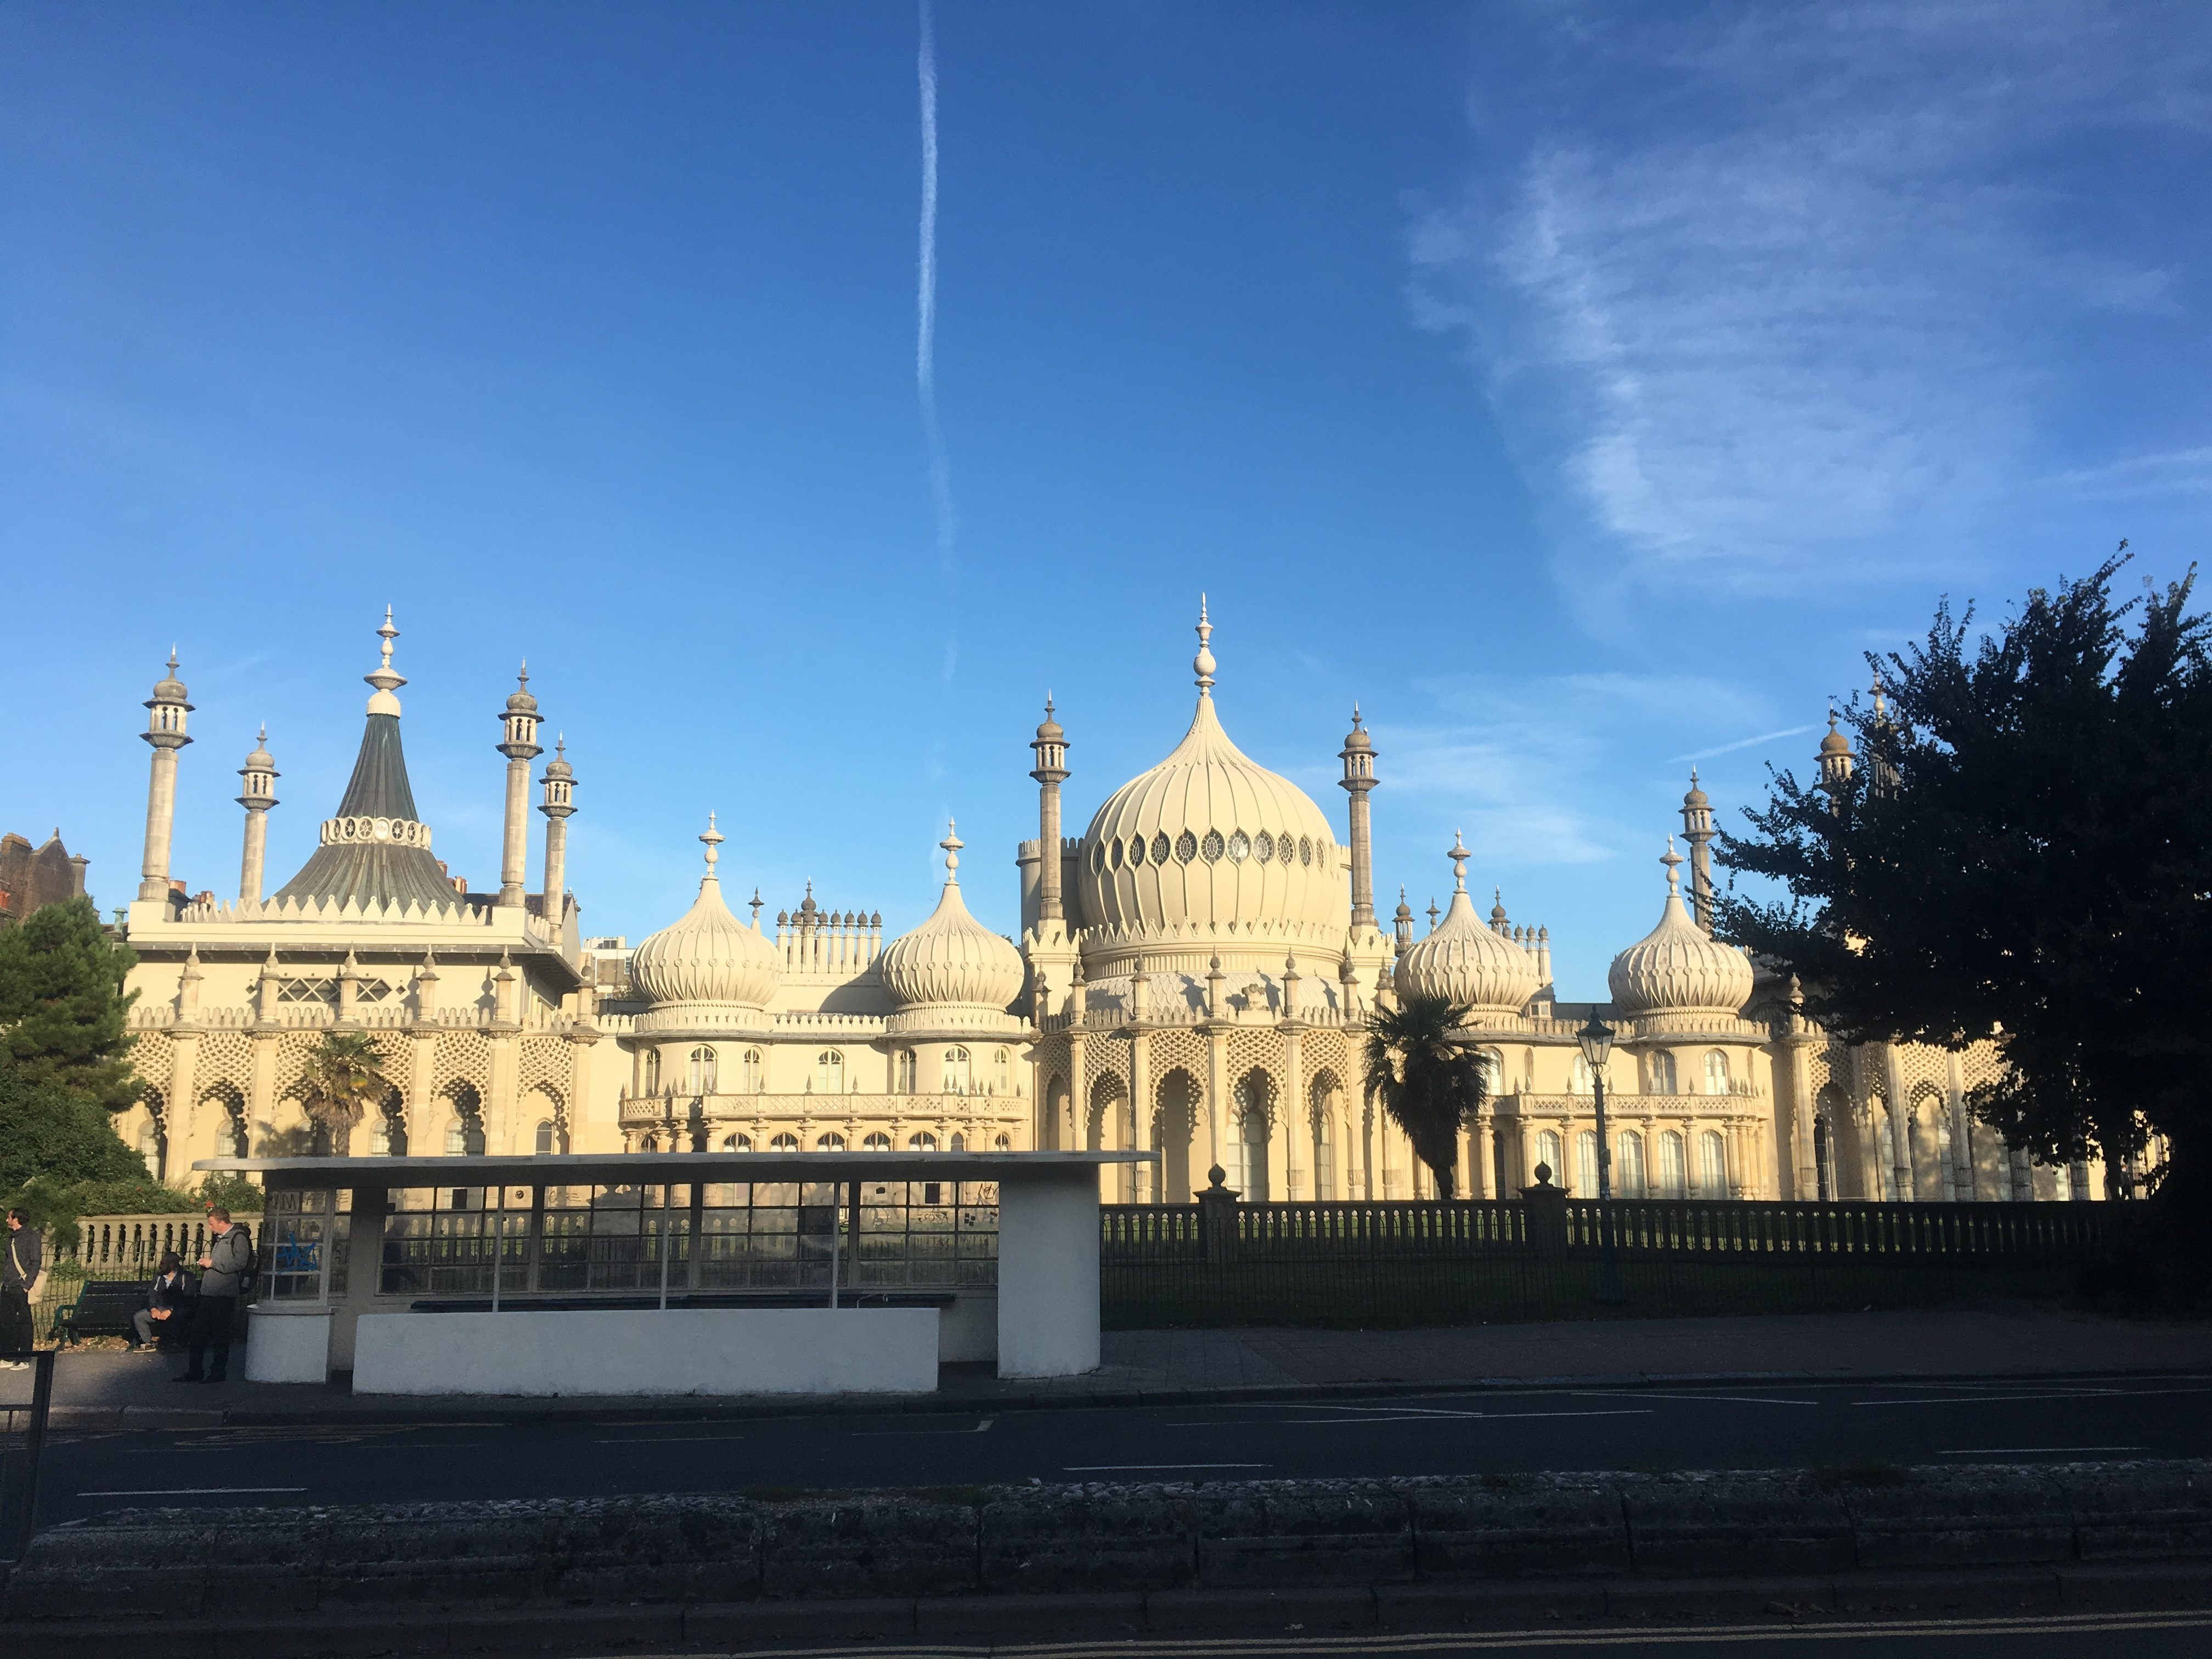 Contrail above Brighton Pavilion